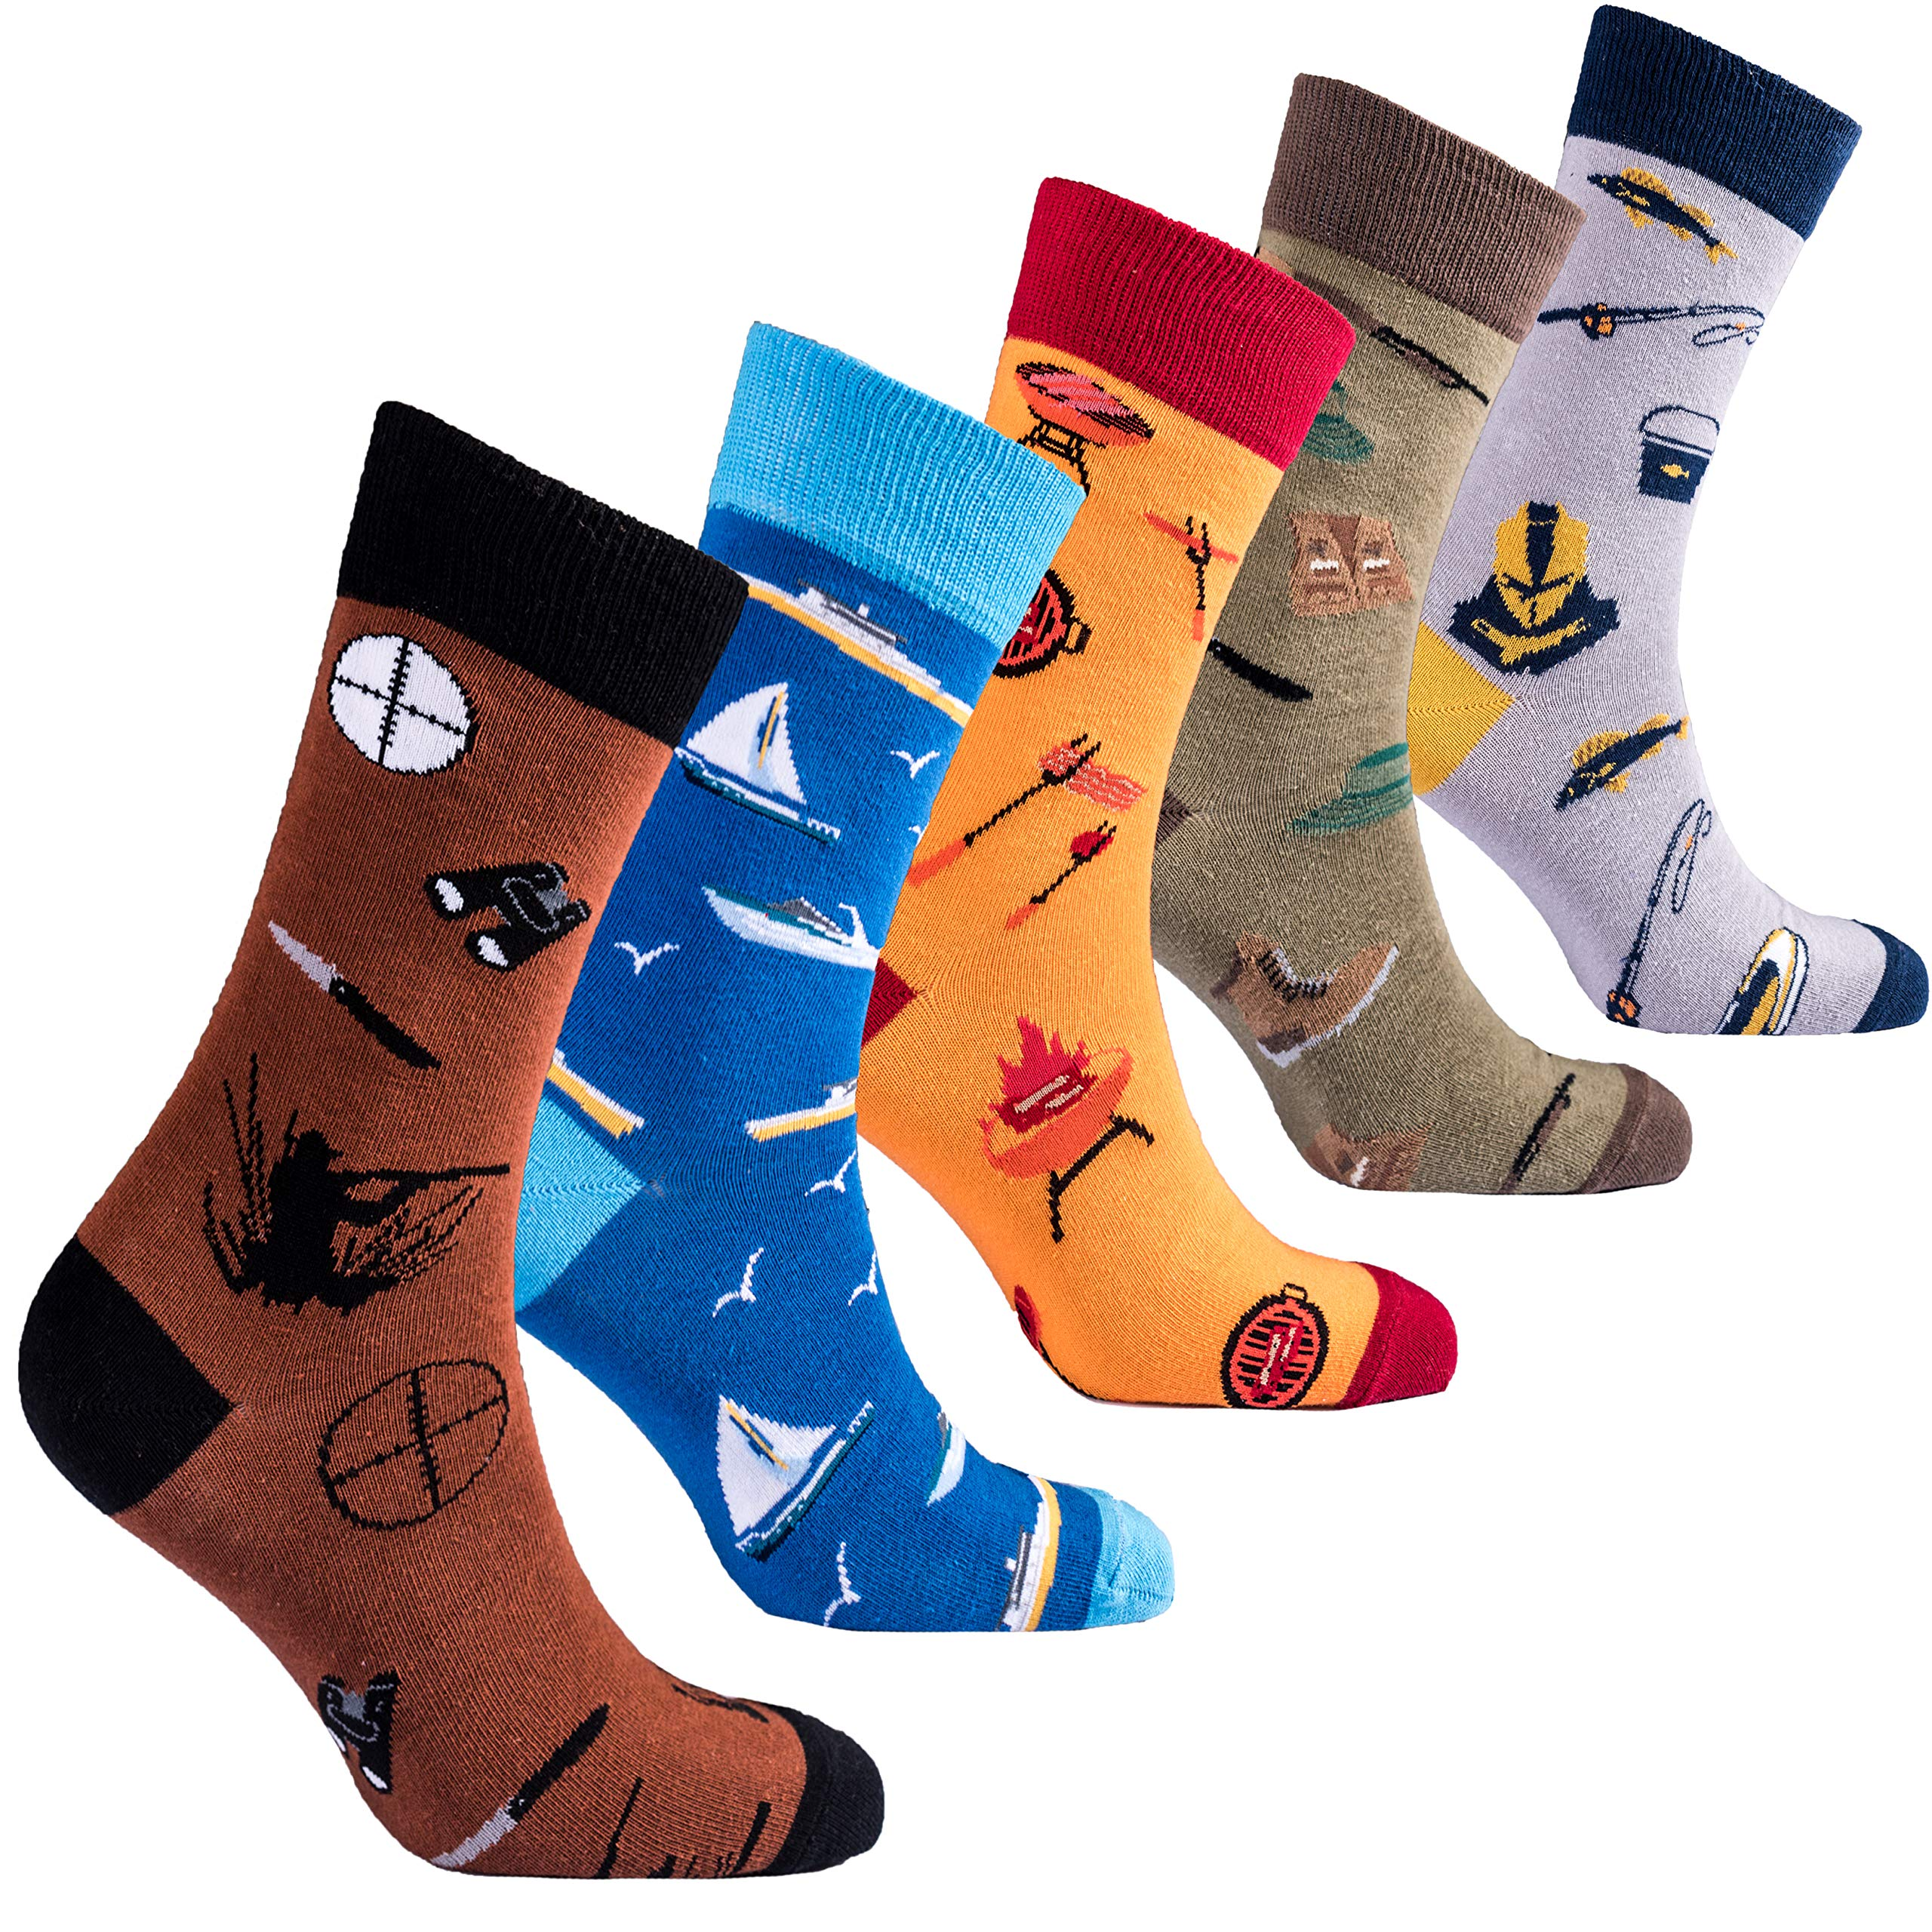 Socks n Socks-Men 5pk Colorful Cotton Novelty Hunter Fisherman BBQ Sock Gift Box